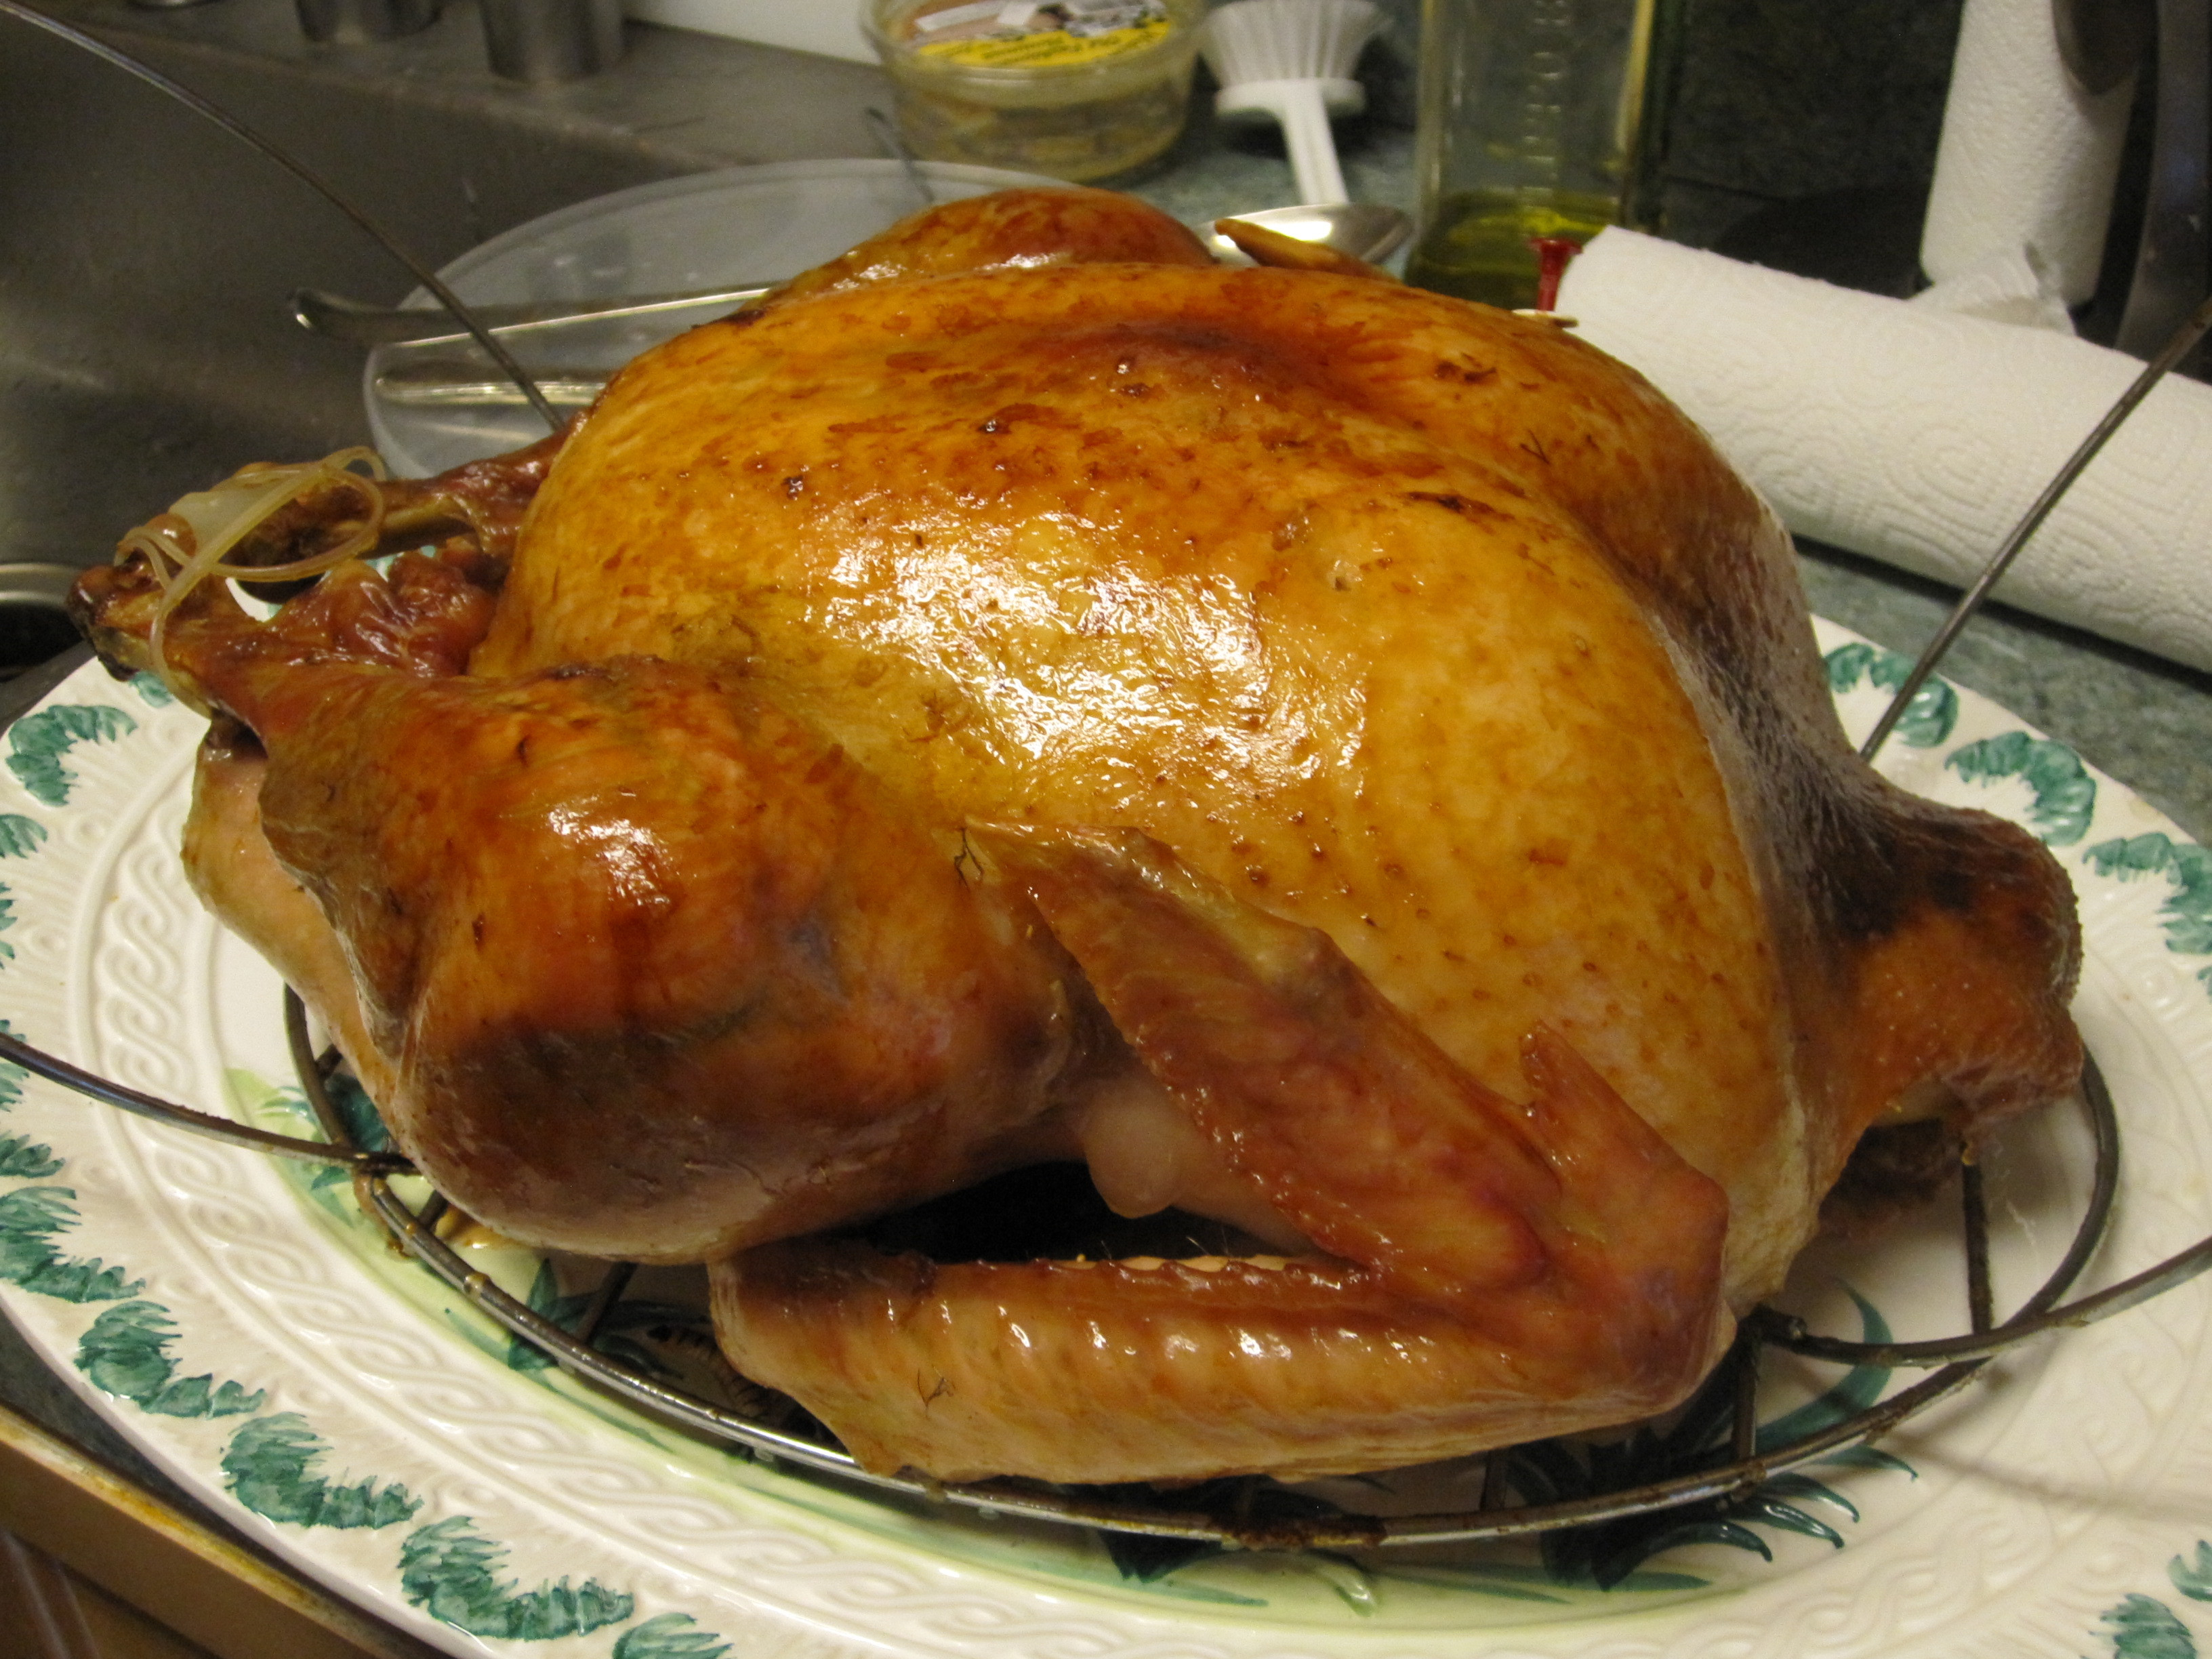 Precooked Thanksgiving Turkey  Turkeytopia How I Produced a Thanksgiving Turkey Dinner